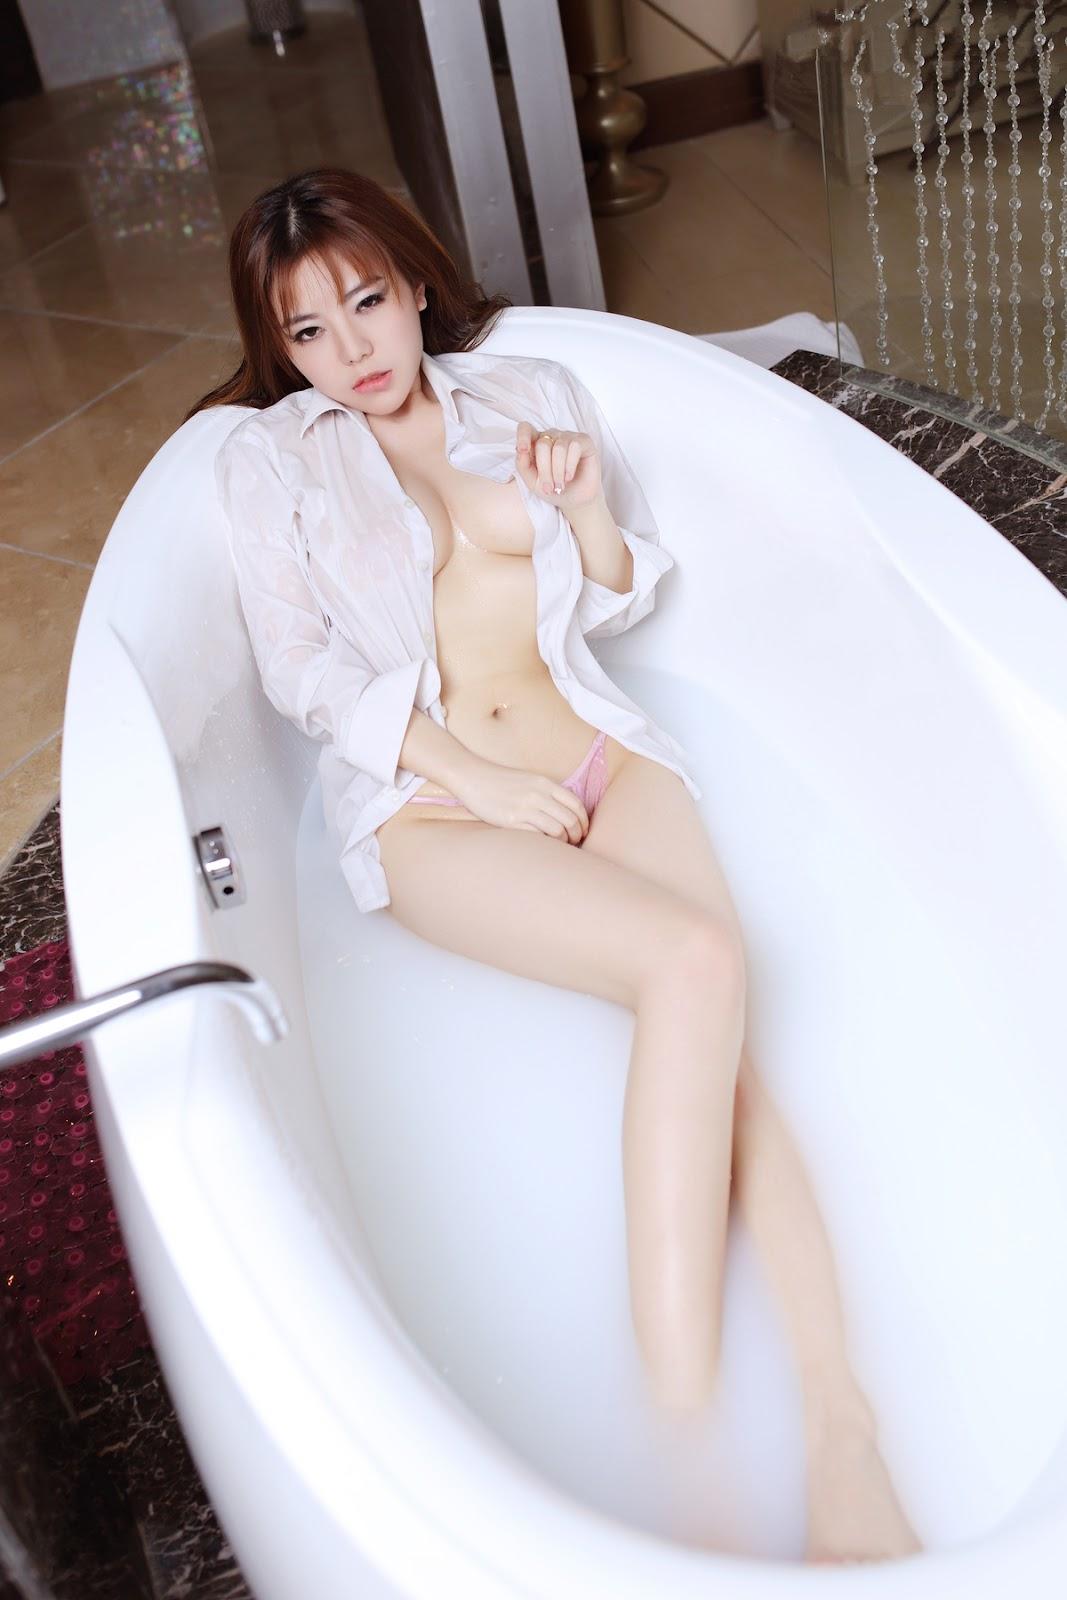 %2529%252B%252B%25C2%25A6%25C2%25B7 19 - TGOD Sexy Nude FAYE